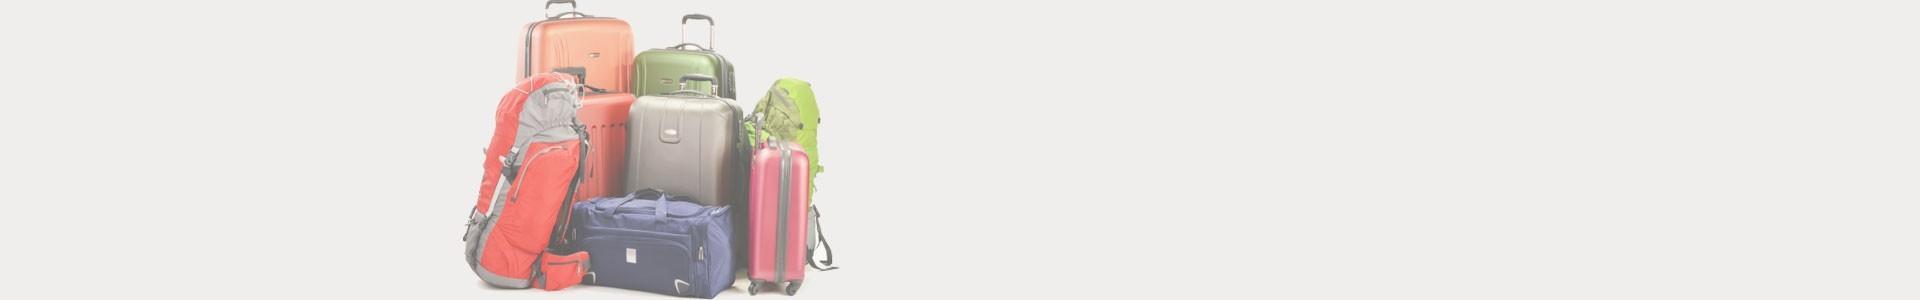 Backpacks & Suitcases online | Buy Now on AnyGivenSunday.Shop